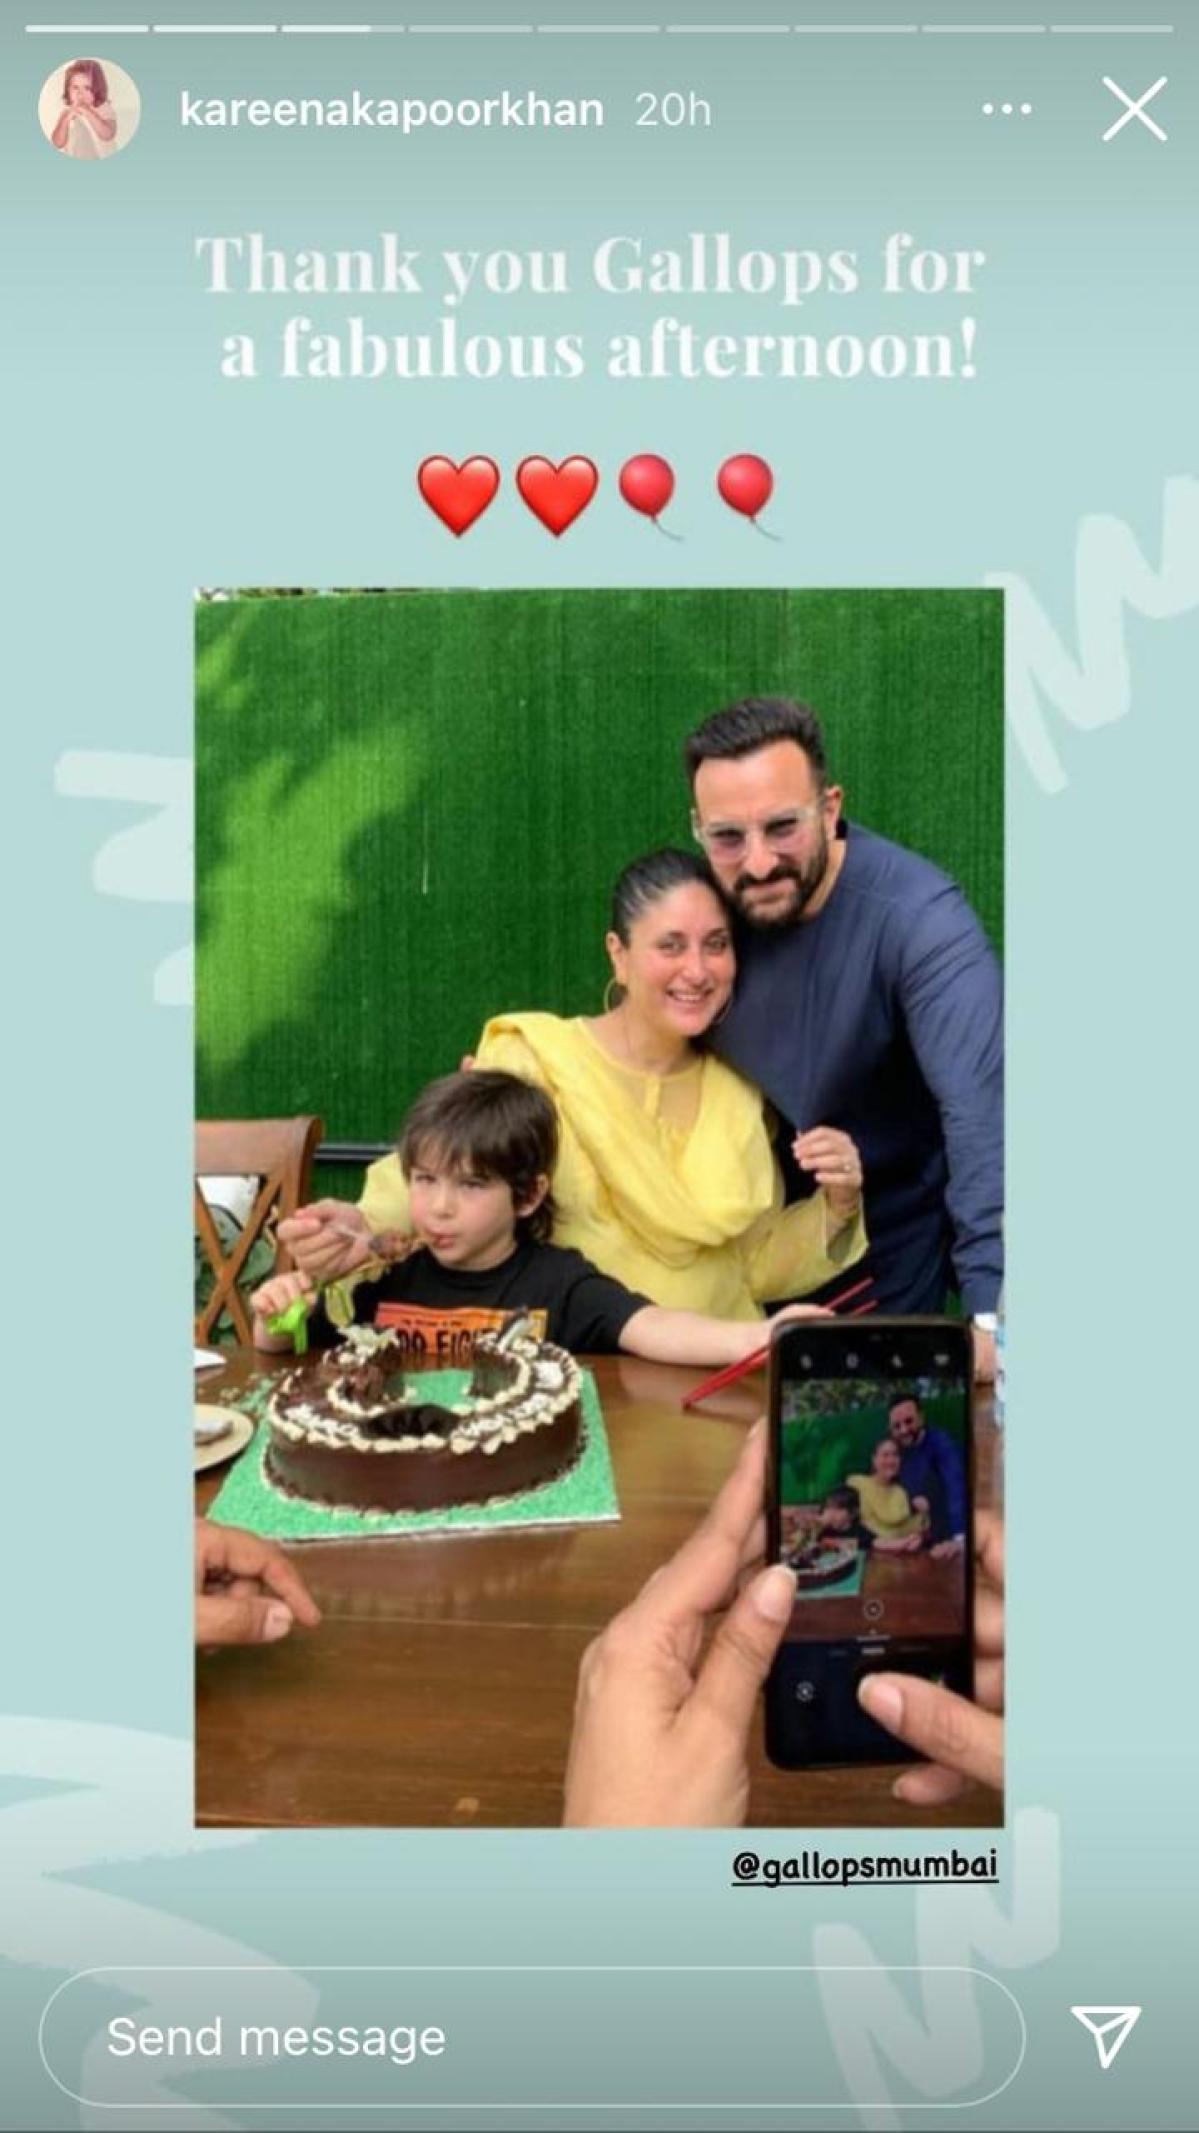 Inside Pics: Saif Ali Khan, Kareena Kapoor throw 'Avengers' themed birthday party for Taimur